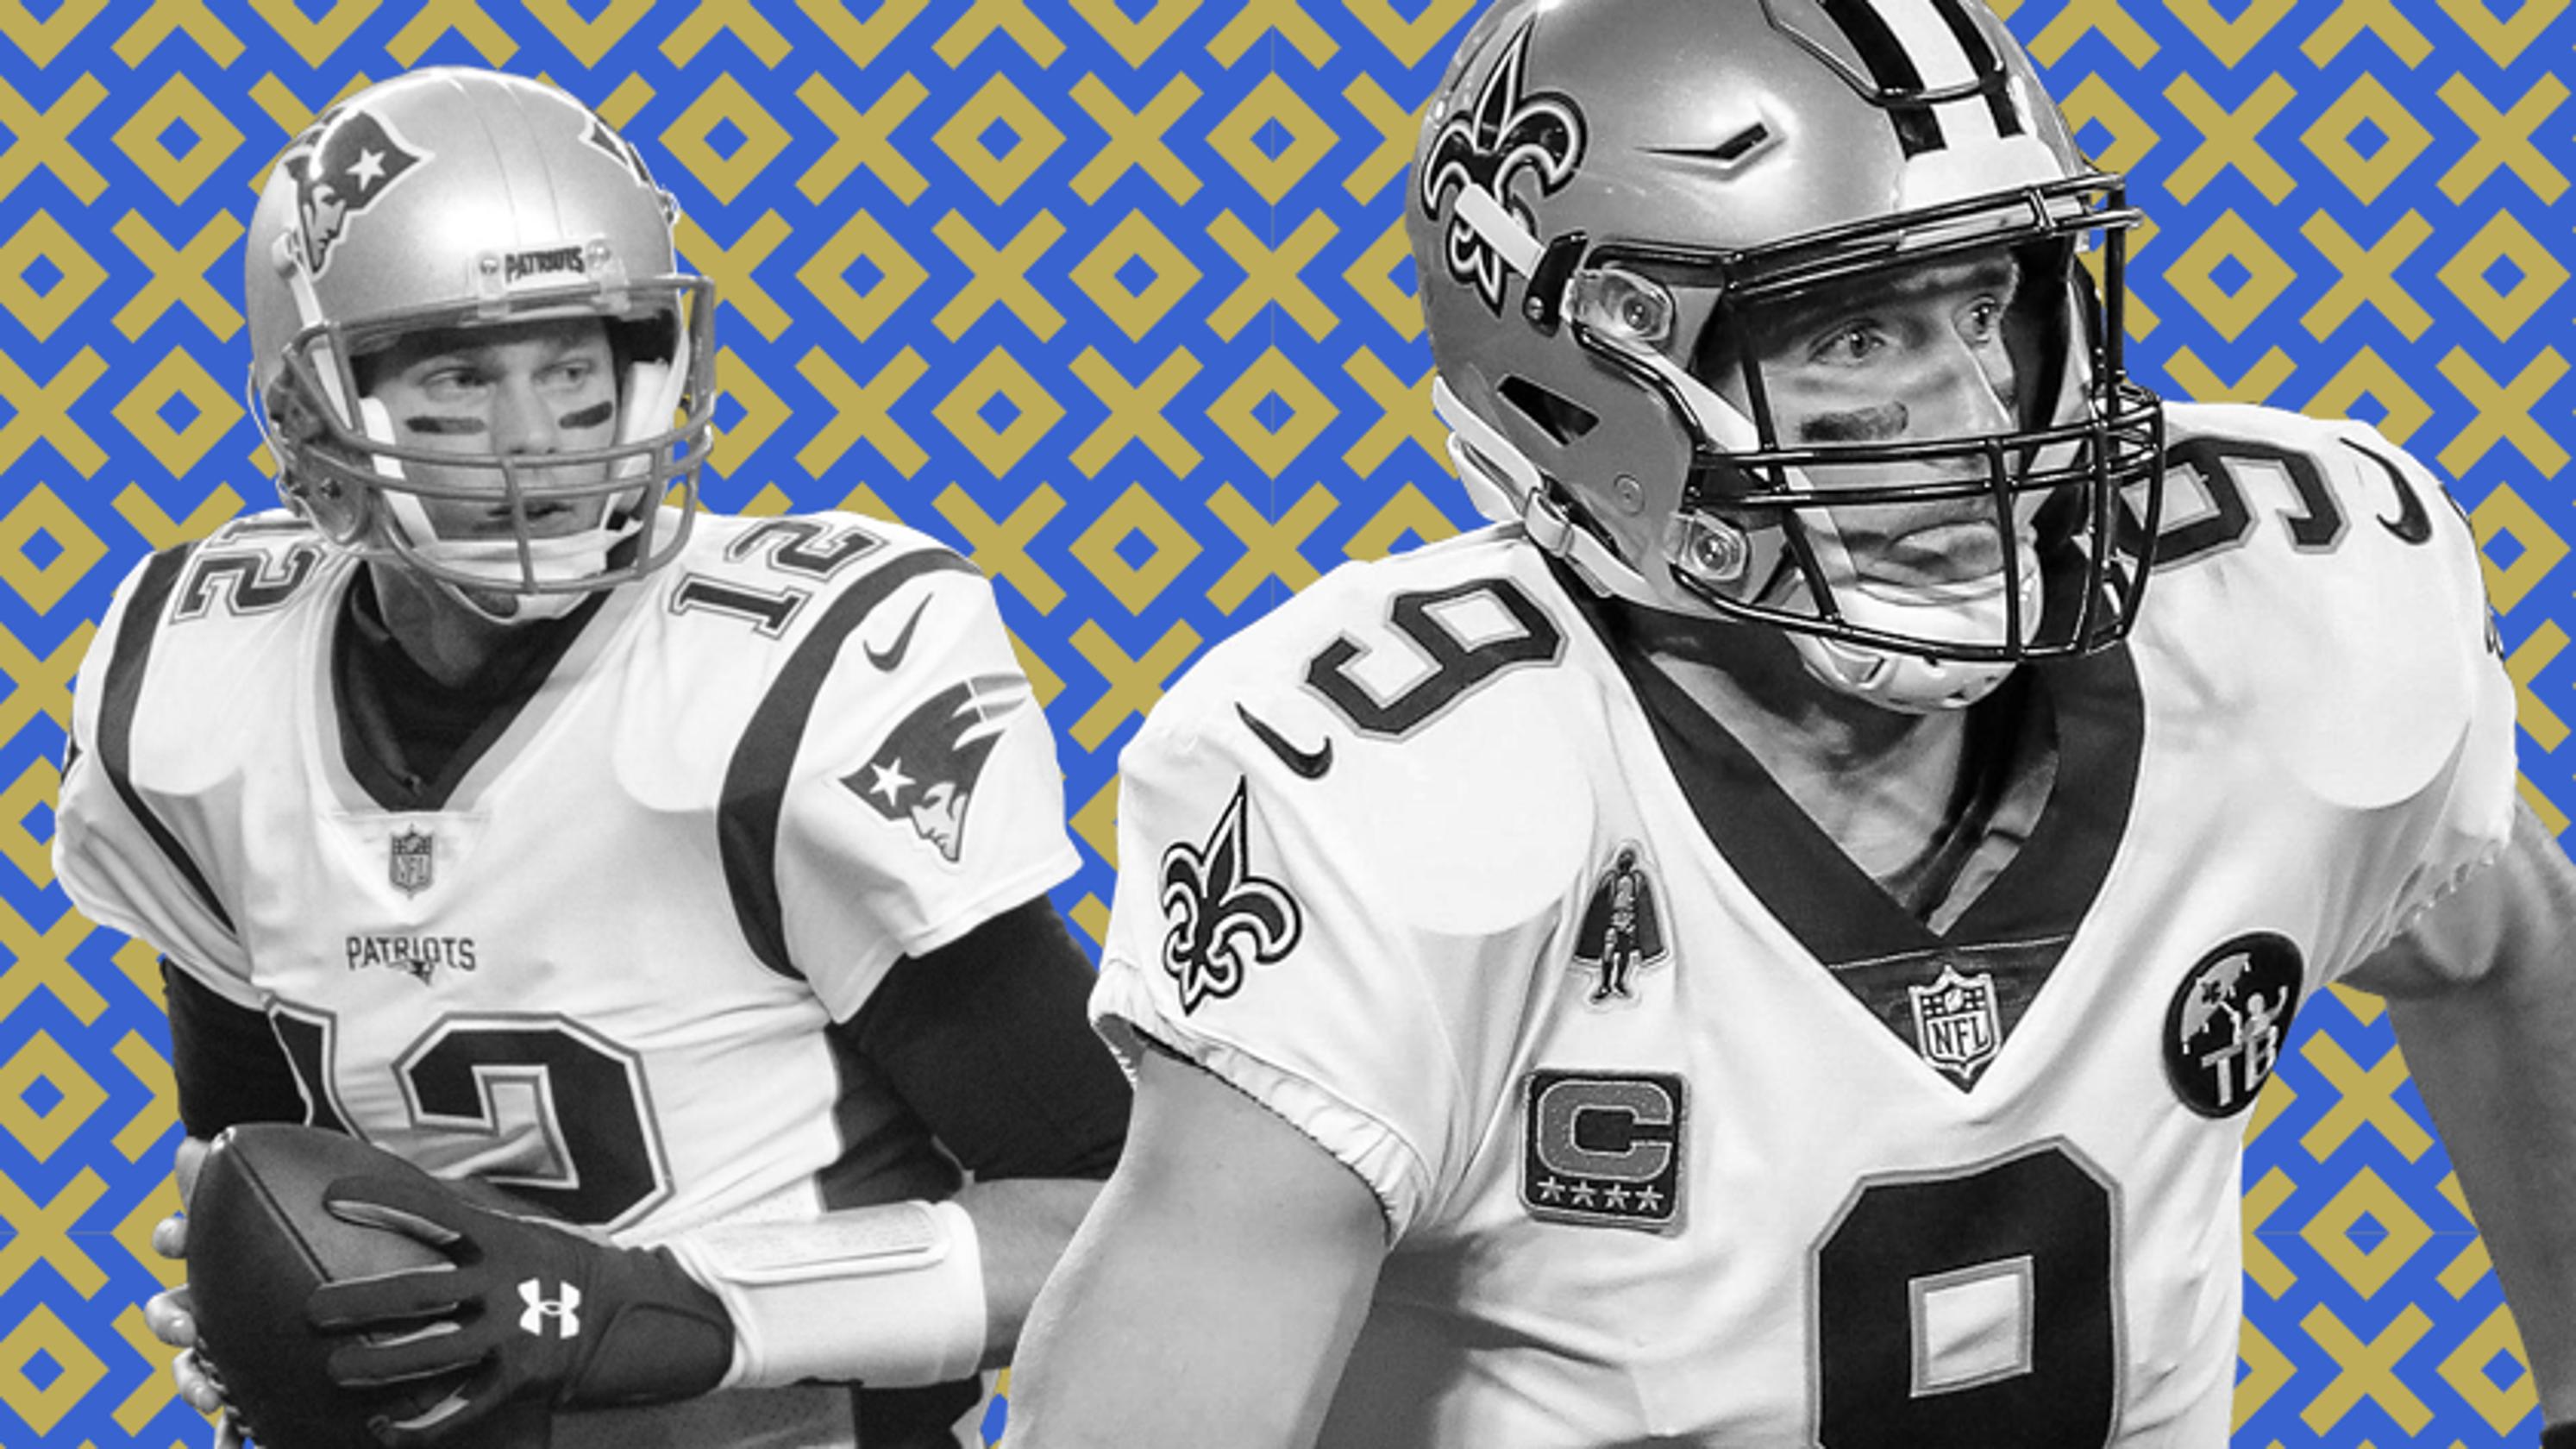 acabdb18 NFL power rankings Week 17: Saints still No. 1, Ravens emerge as force